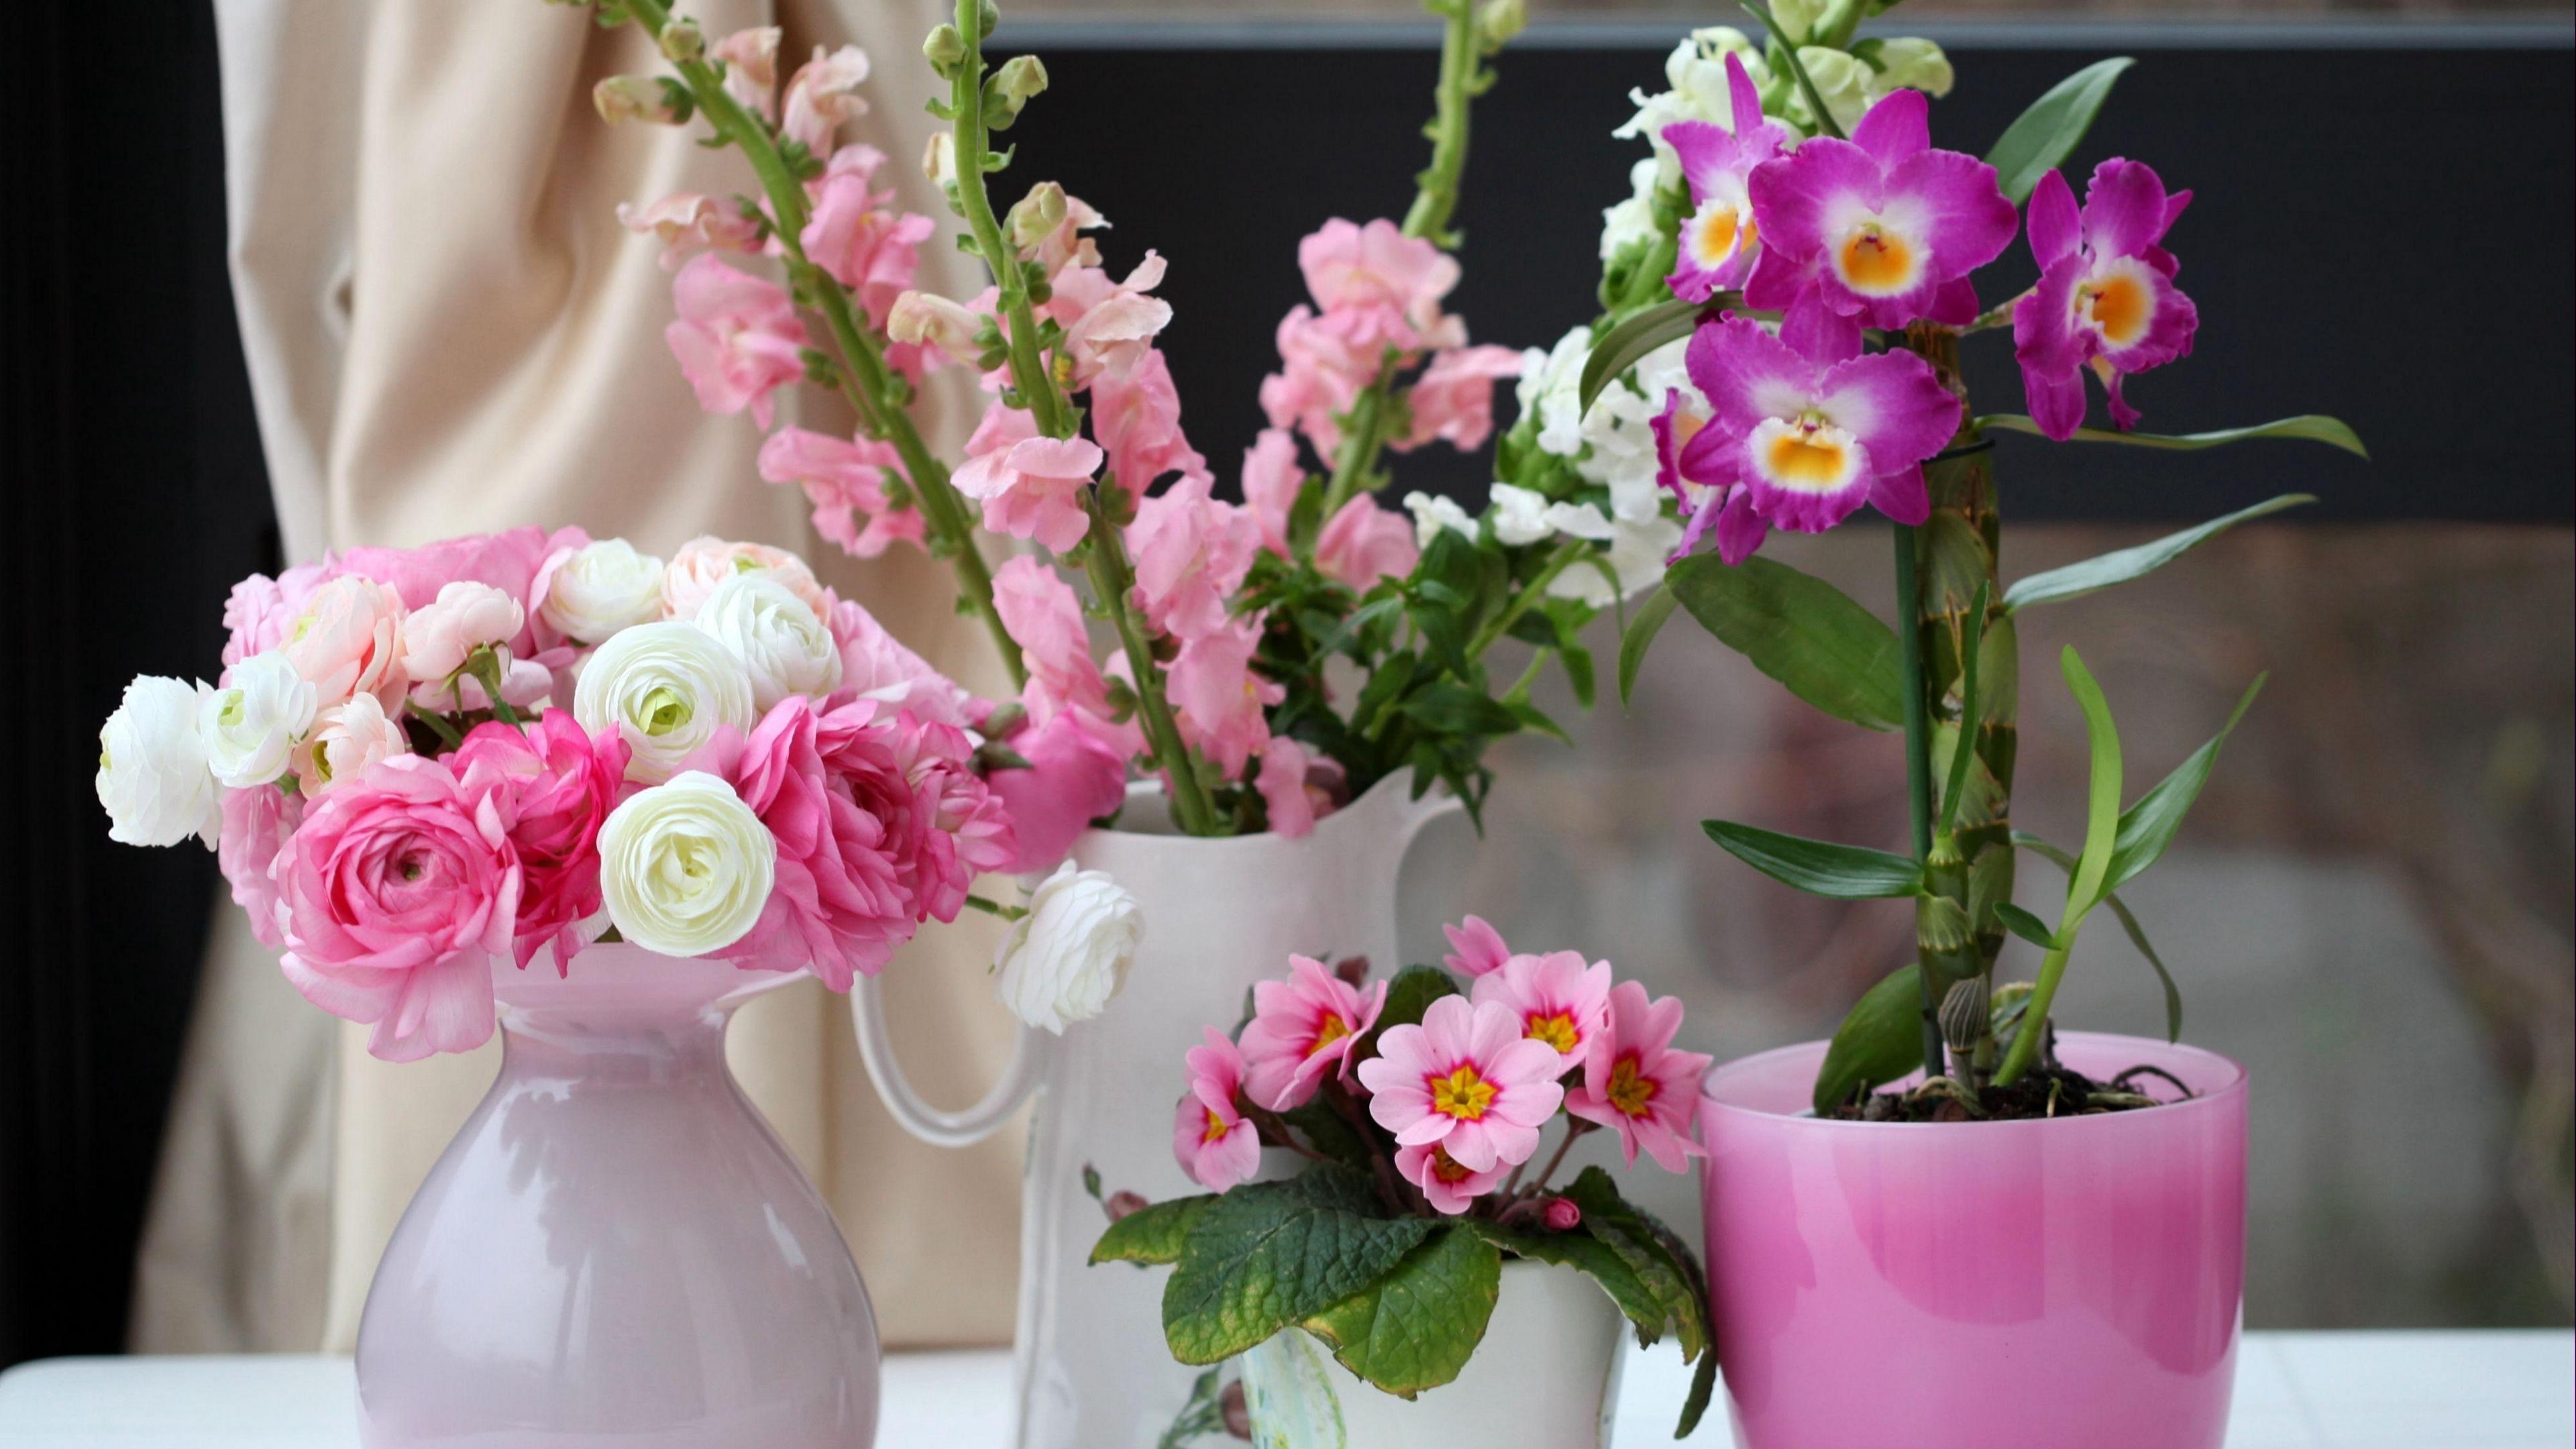 primrose ranunkulyus orchid gillyflower flowers beauty 4k 1540064747 - primrose, ranunkulyus, orchid, gillyflower, flowers, beauty 4k - ranunkulyus, primrose, Orchid